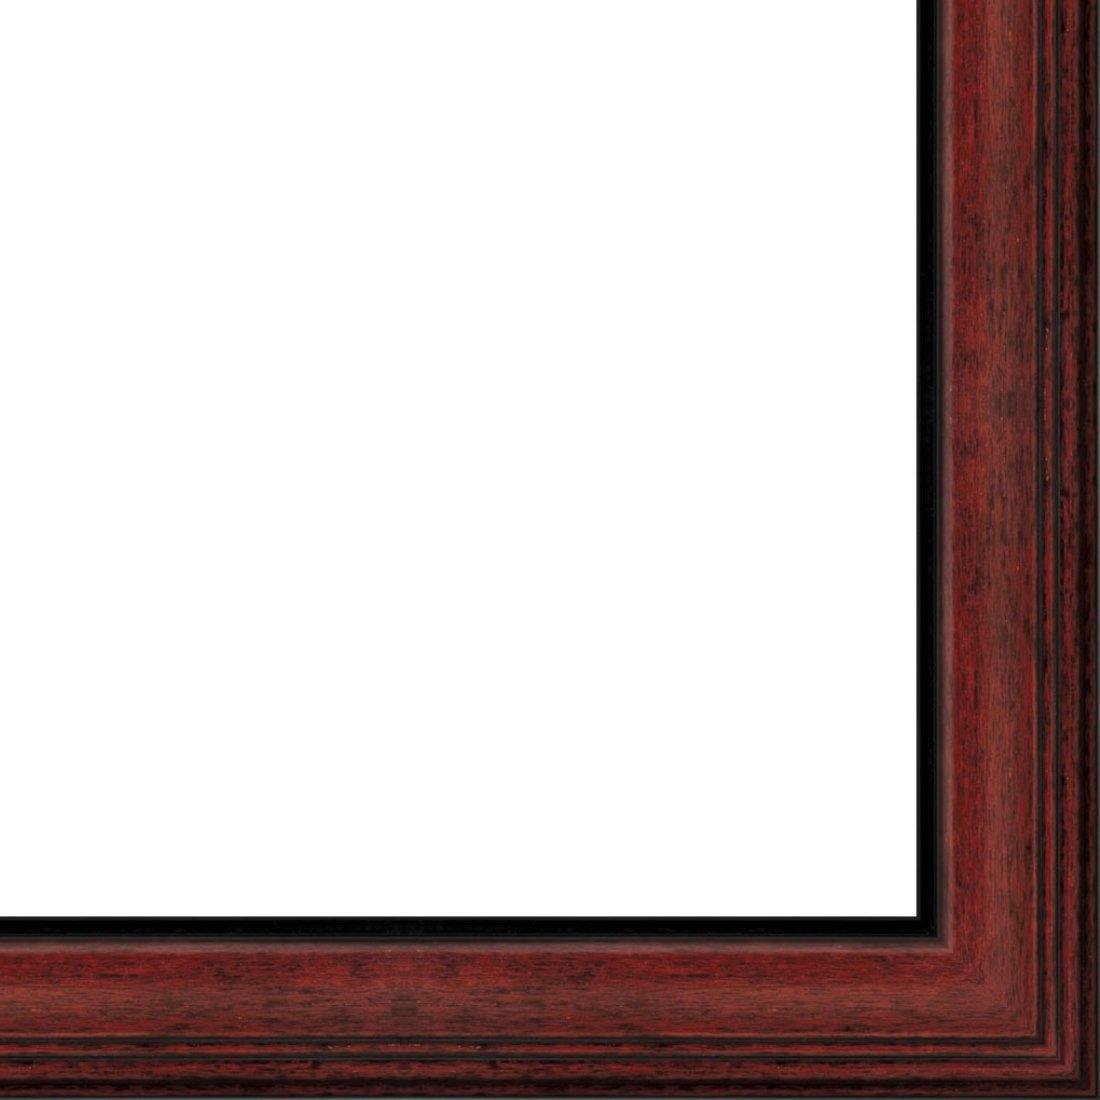 Picture Frame Moulding (Wood) 18ft bundle - Traditional Mahogany Finish - 2.375'' width - 1/2'' rabbet depth